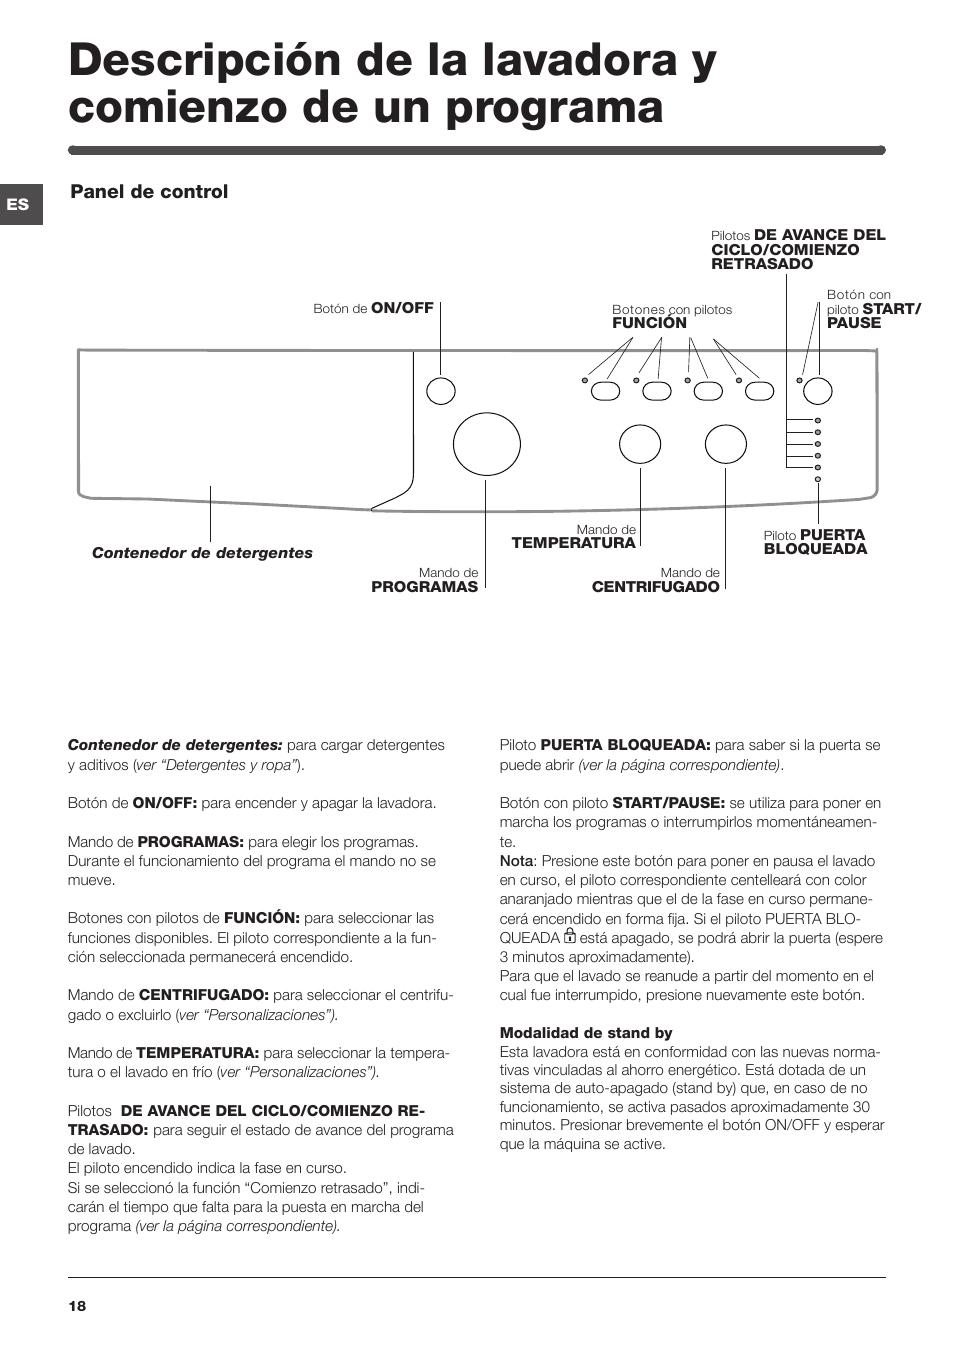 indesit iwc 61051 eu user manual page 18 72 original mode rh manualsdir com lavadora indesit iwc 61051 manual manual instrucciones lavadora indesit iwc 61051